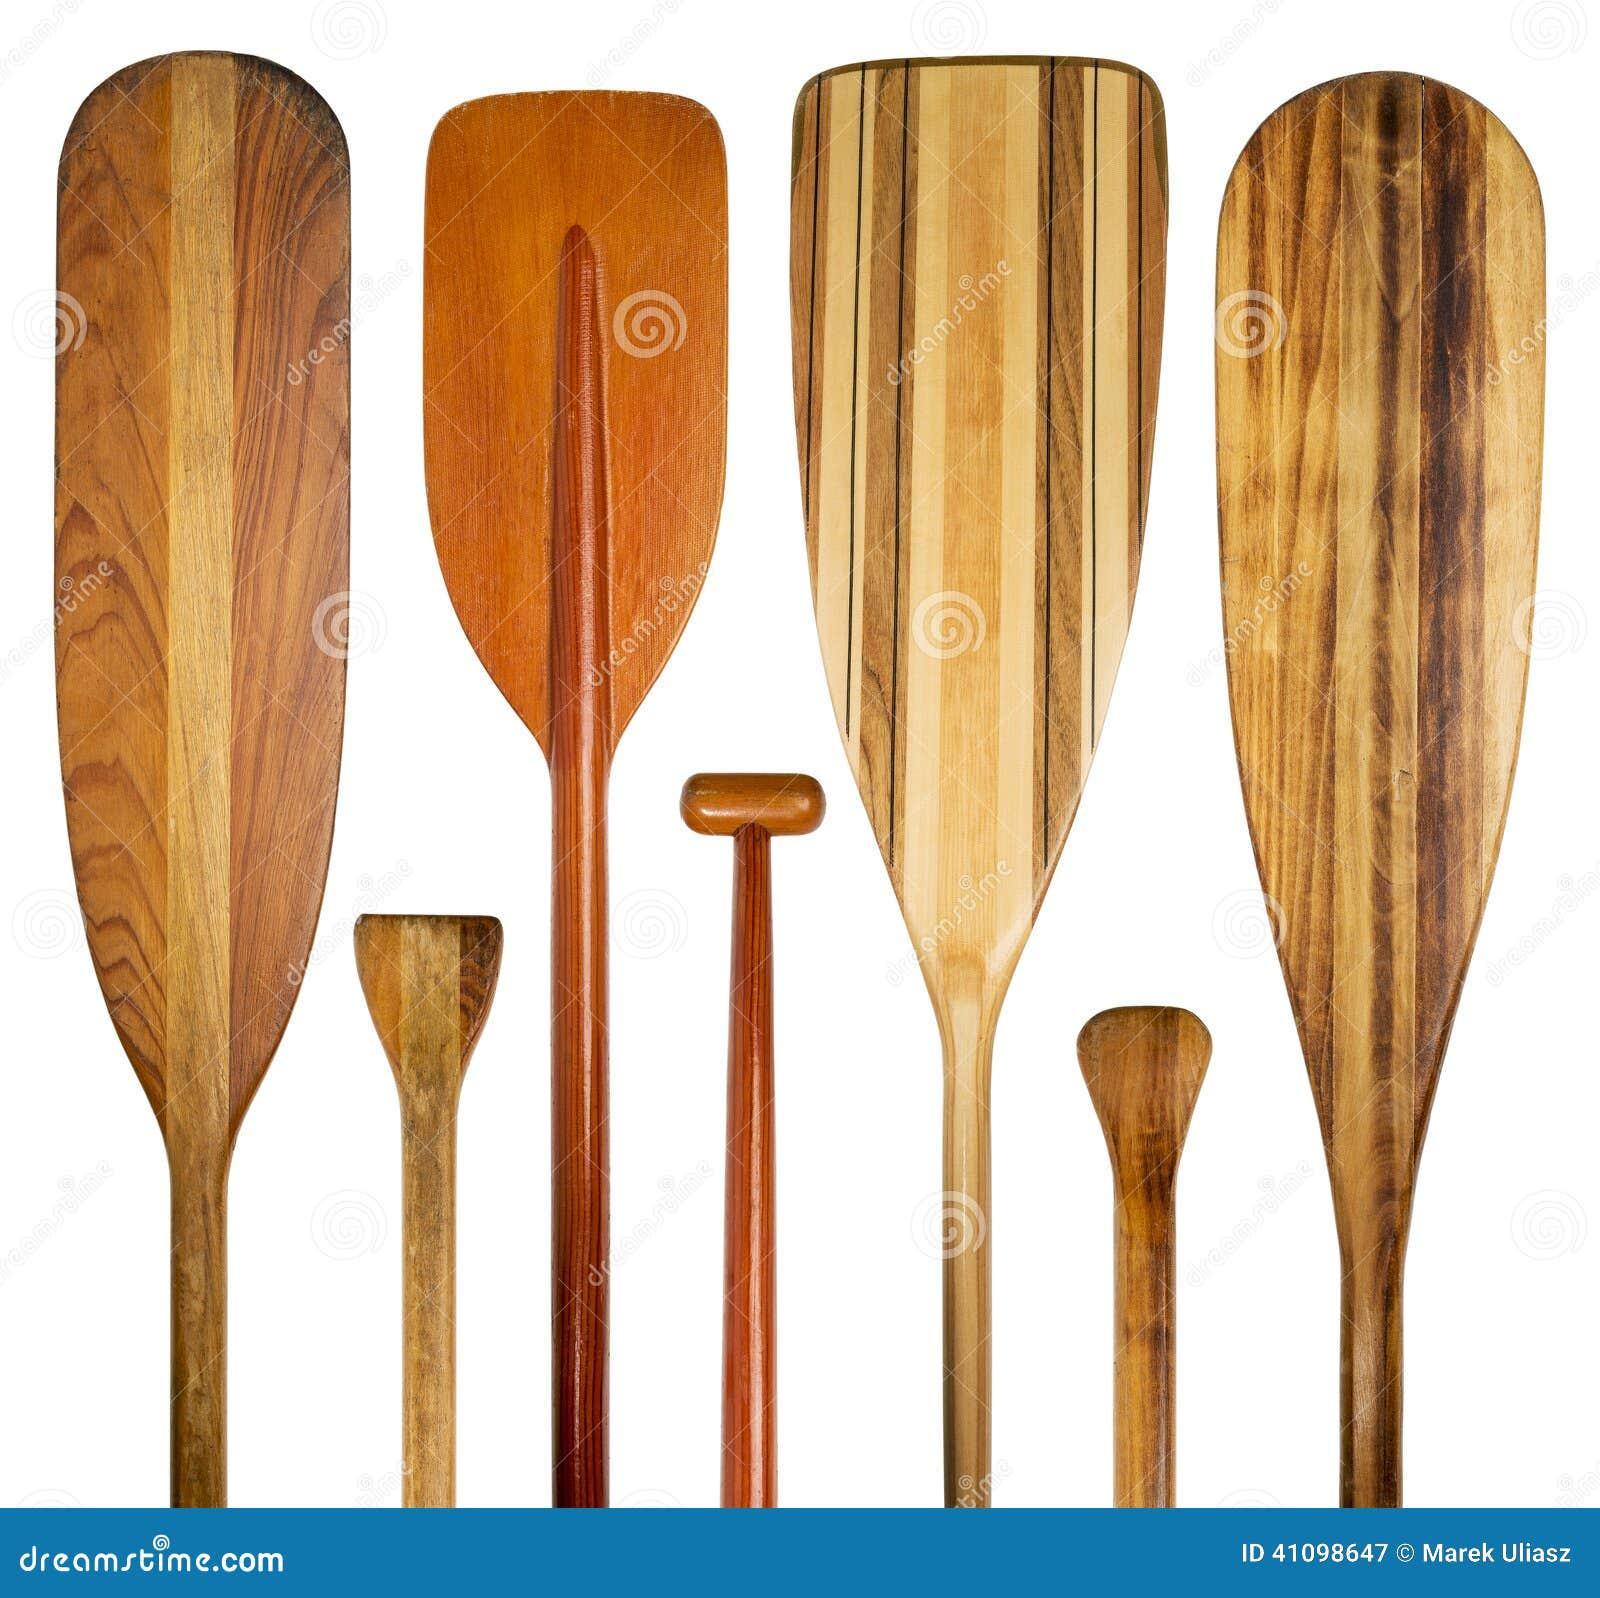 Canoe Paddle Blades : Wood canoe paddles abstract stock image